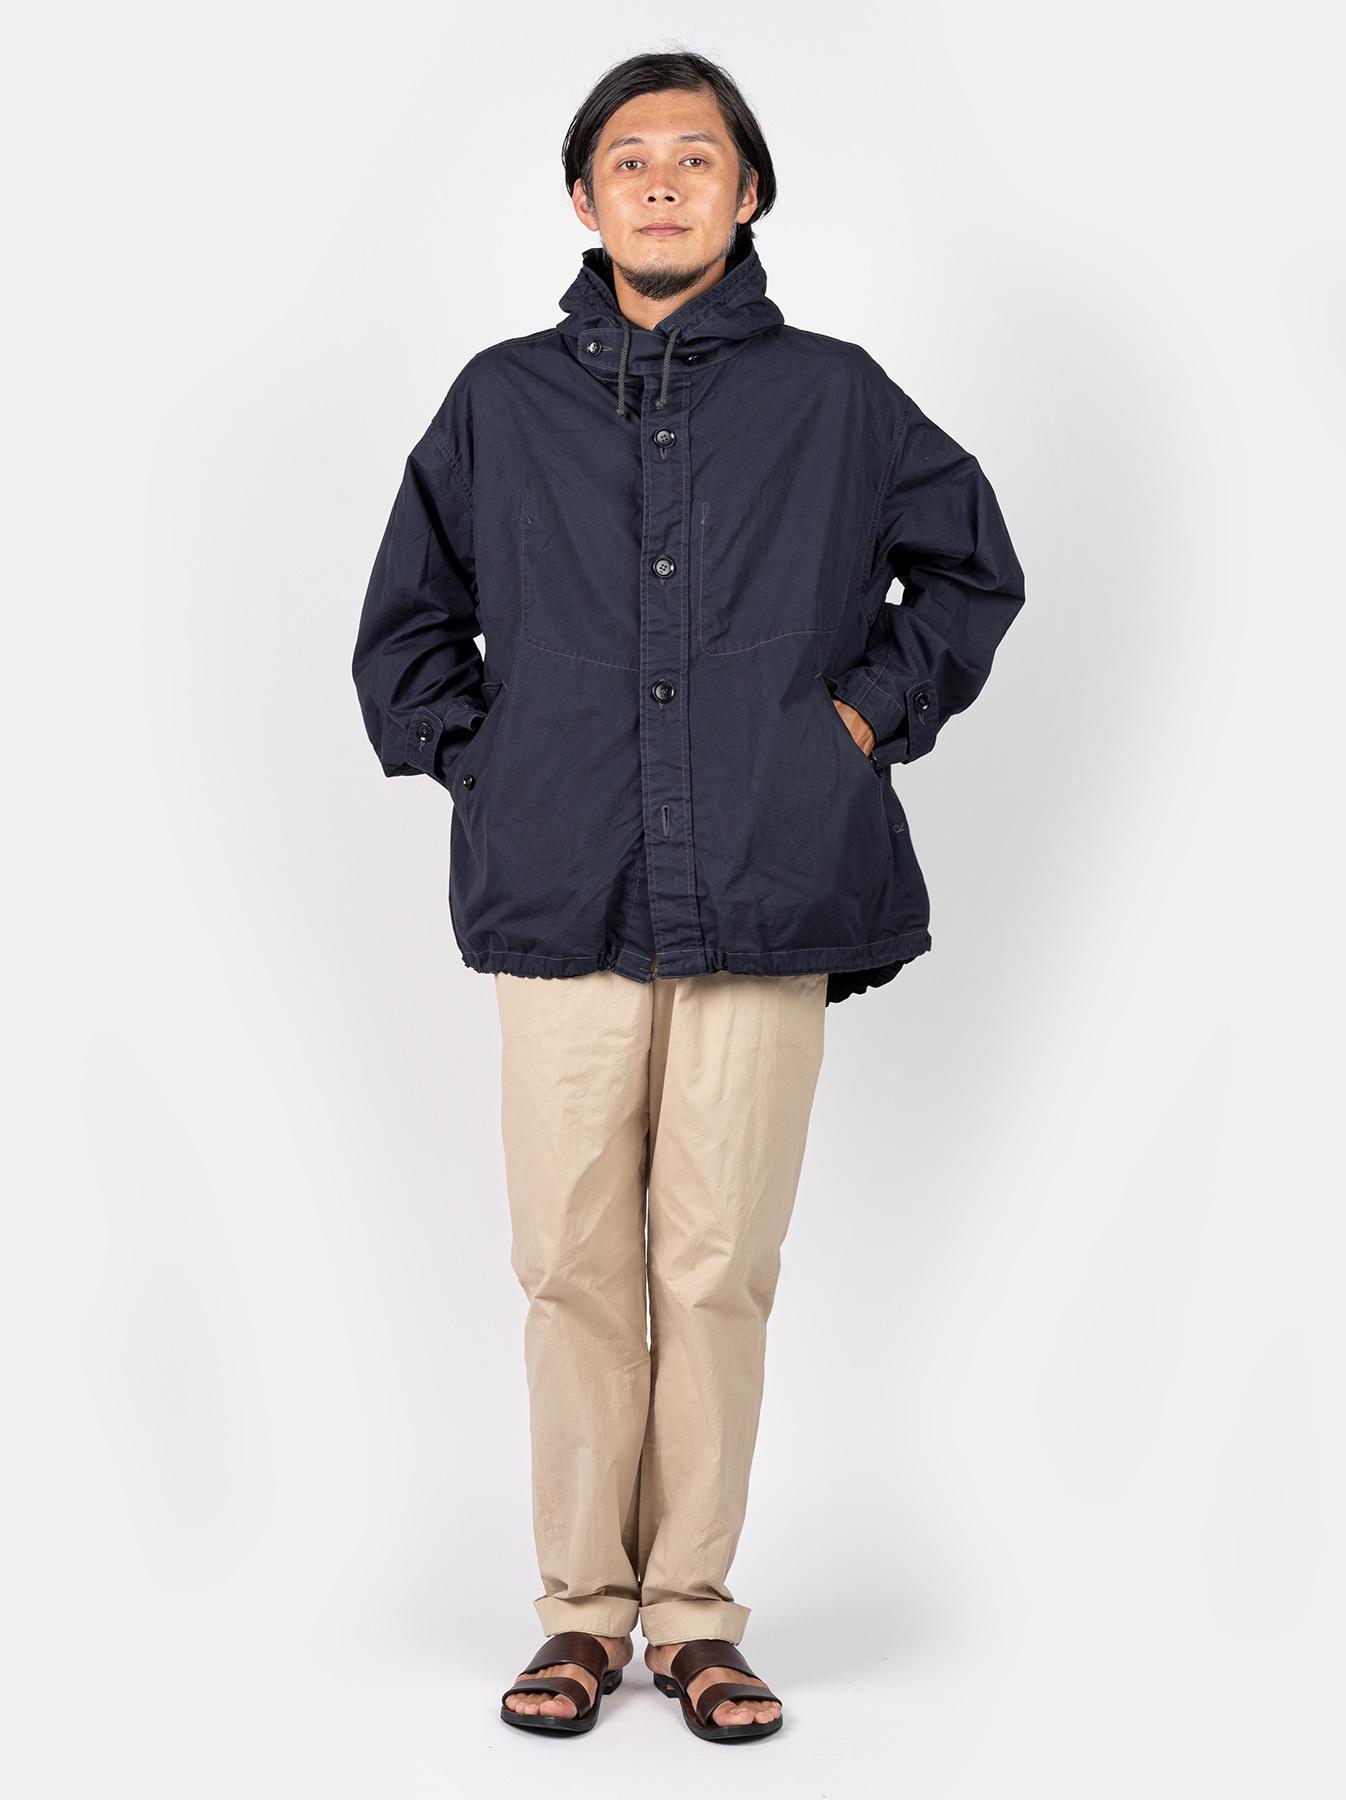 Weather Cloth Umahiko Mods Hoodie-2